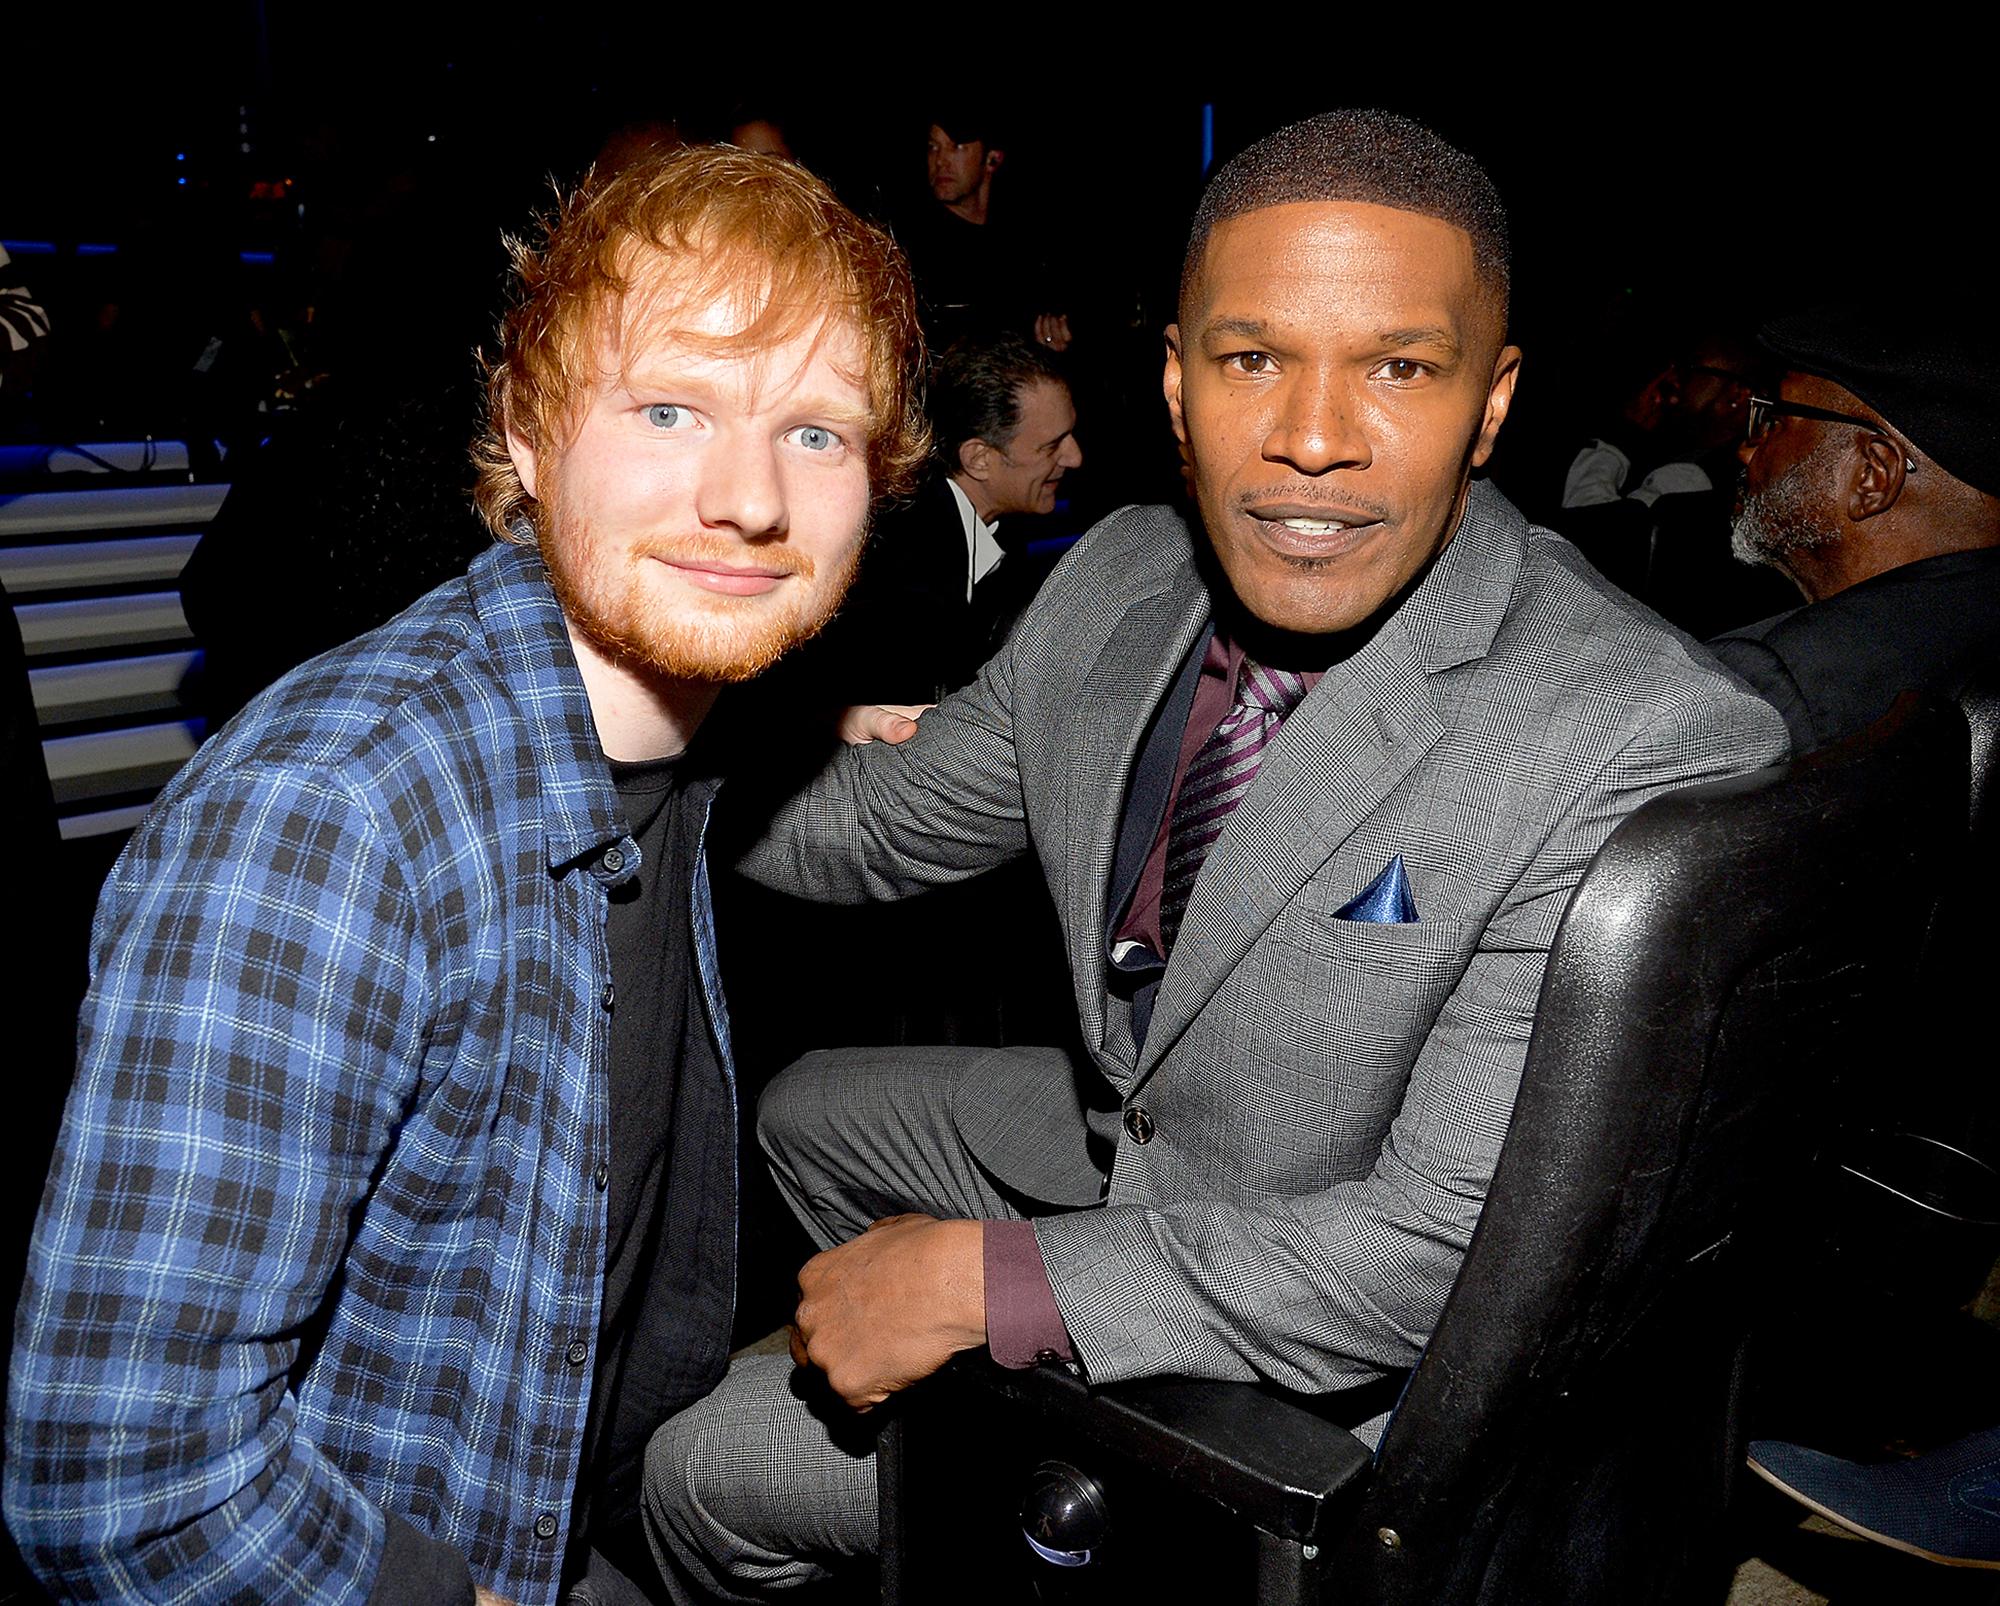 Ed Sheeran and Jamie Foxx